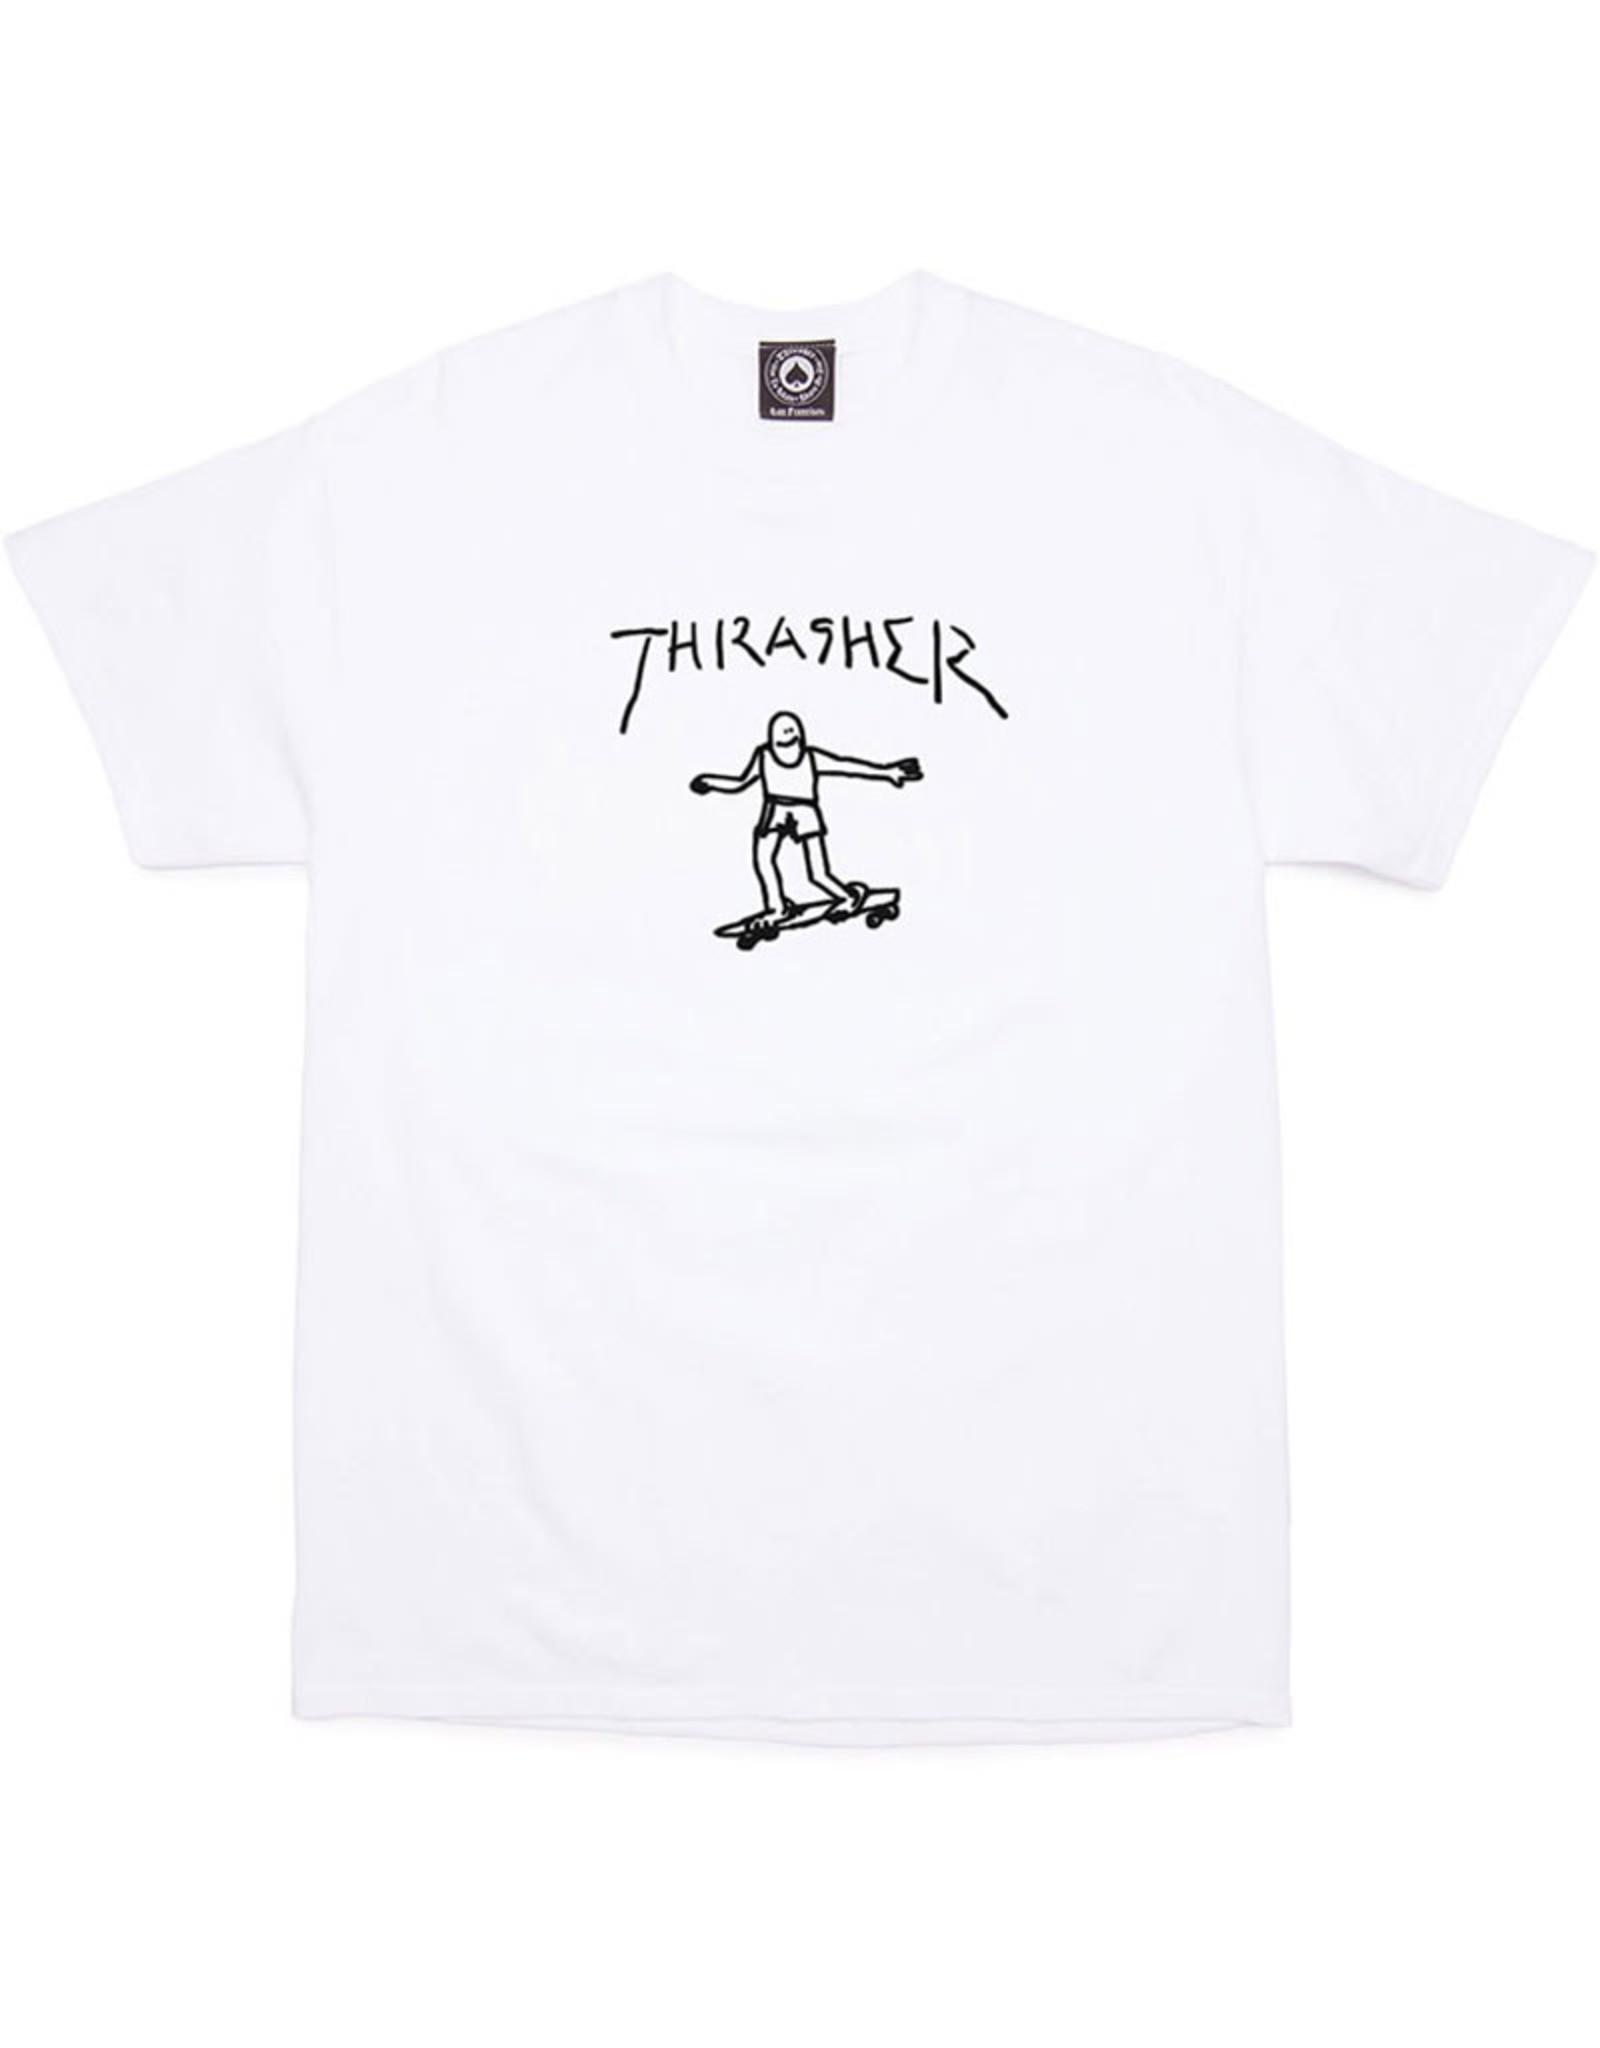 Thrasher Thrasher Tee Mens Gonz S/S (White)